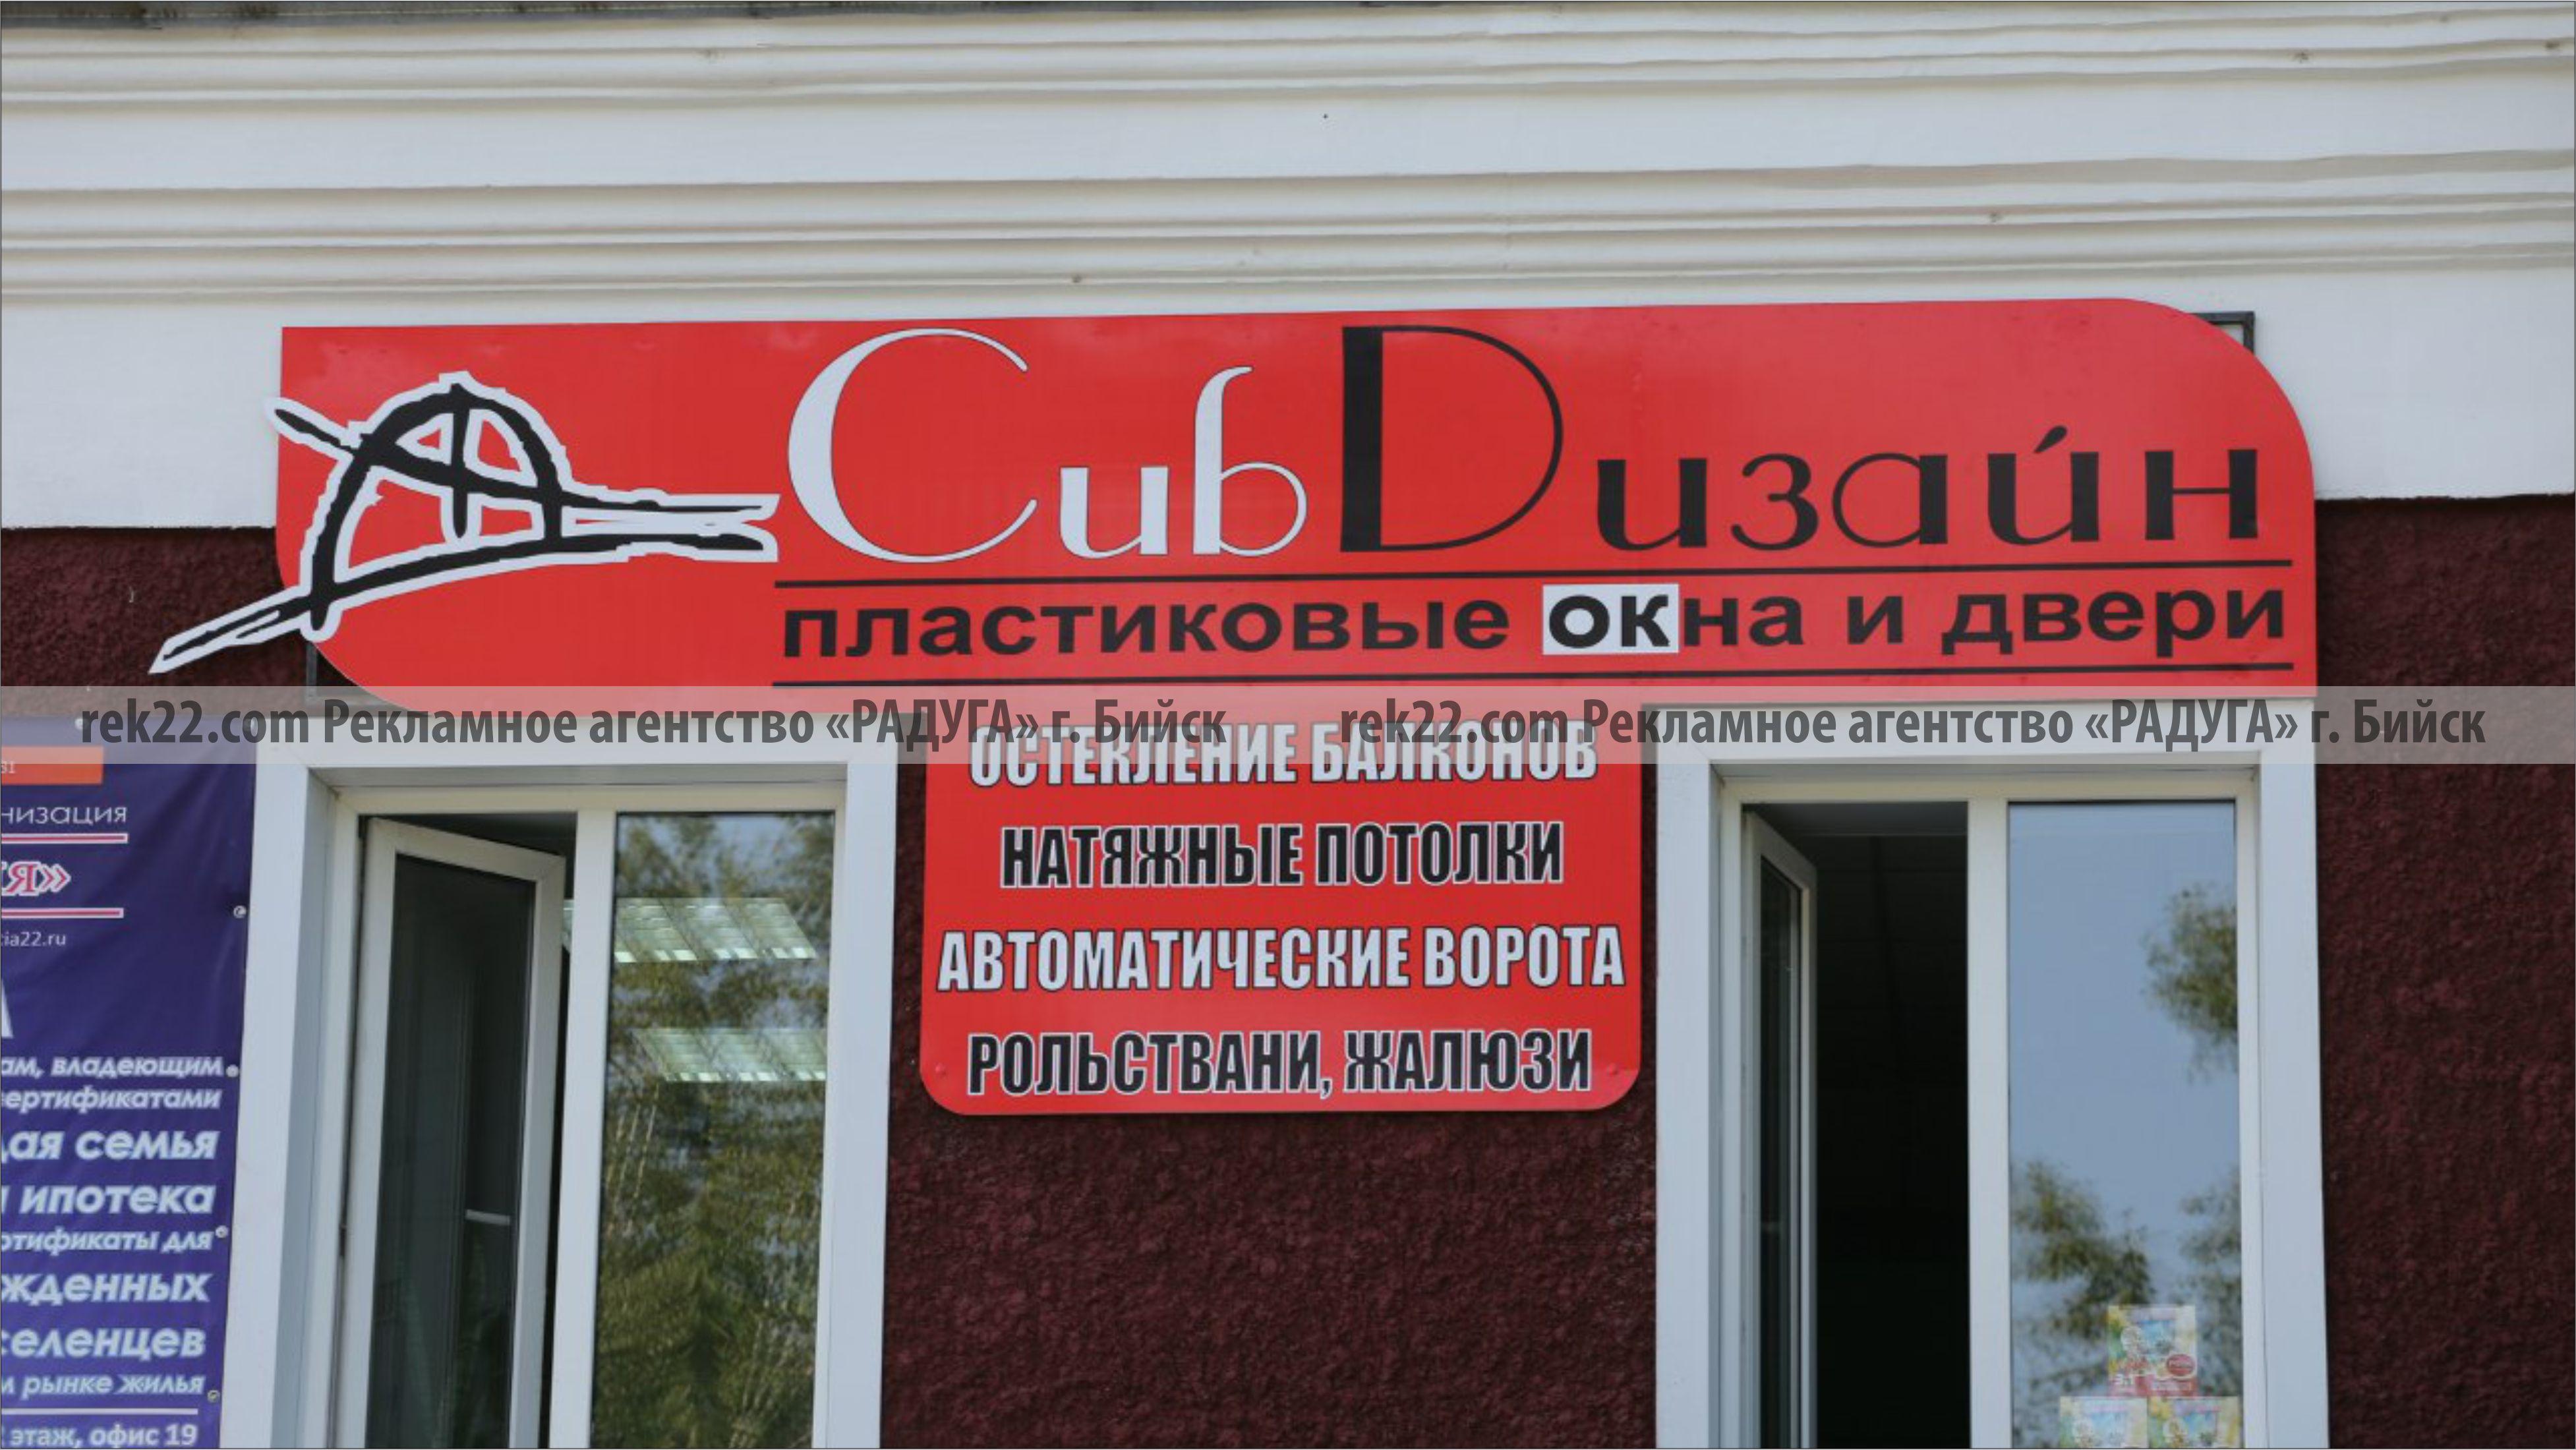 Реклама на транспорте Бийск - вывески, баннера, ПВХ - 8